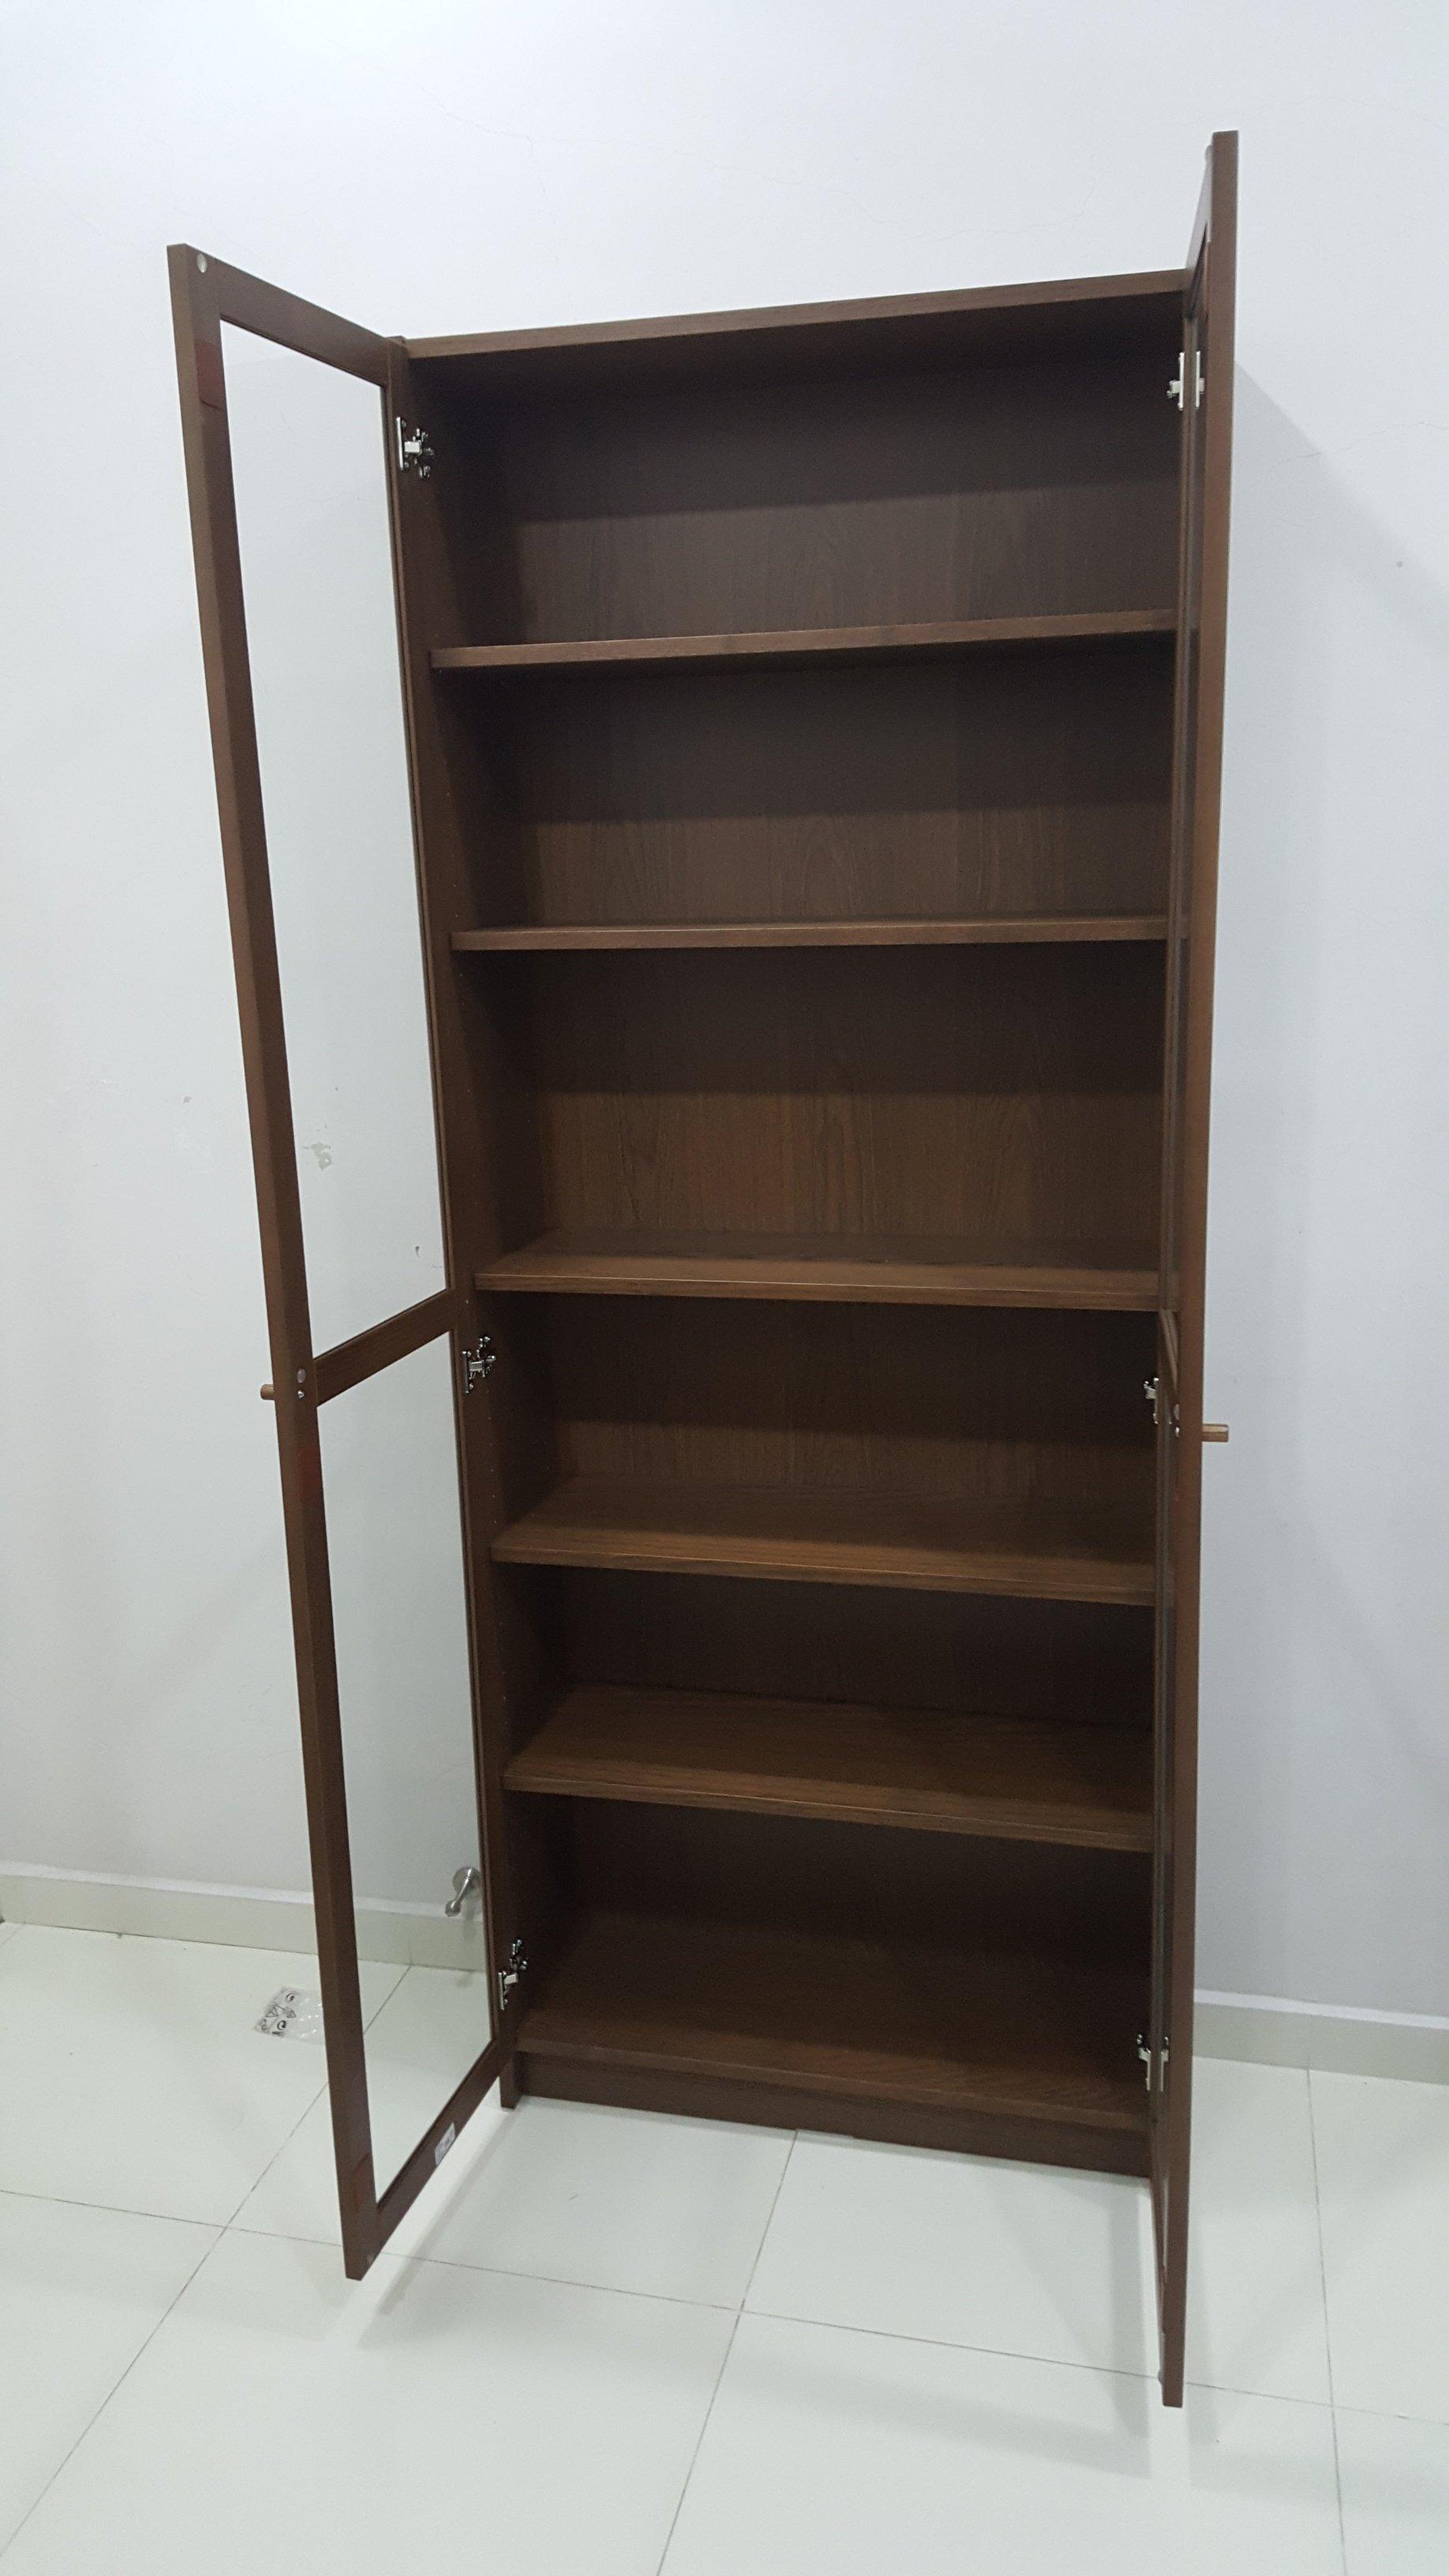 ikea billy oxberg bookcase cupboard with glass door dr koh kho king. Black Bedroom Furniture Sets. Home Design Ideas